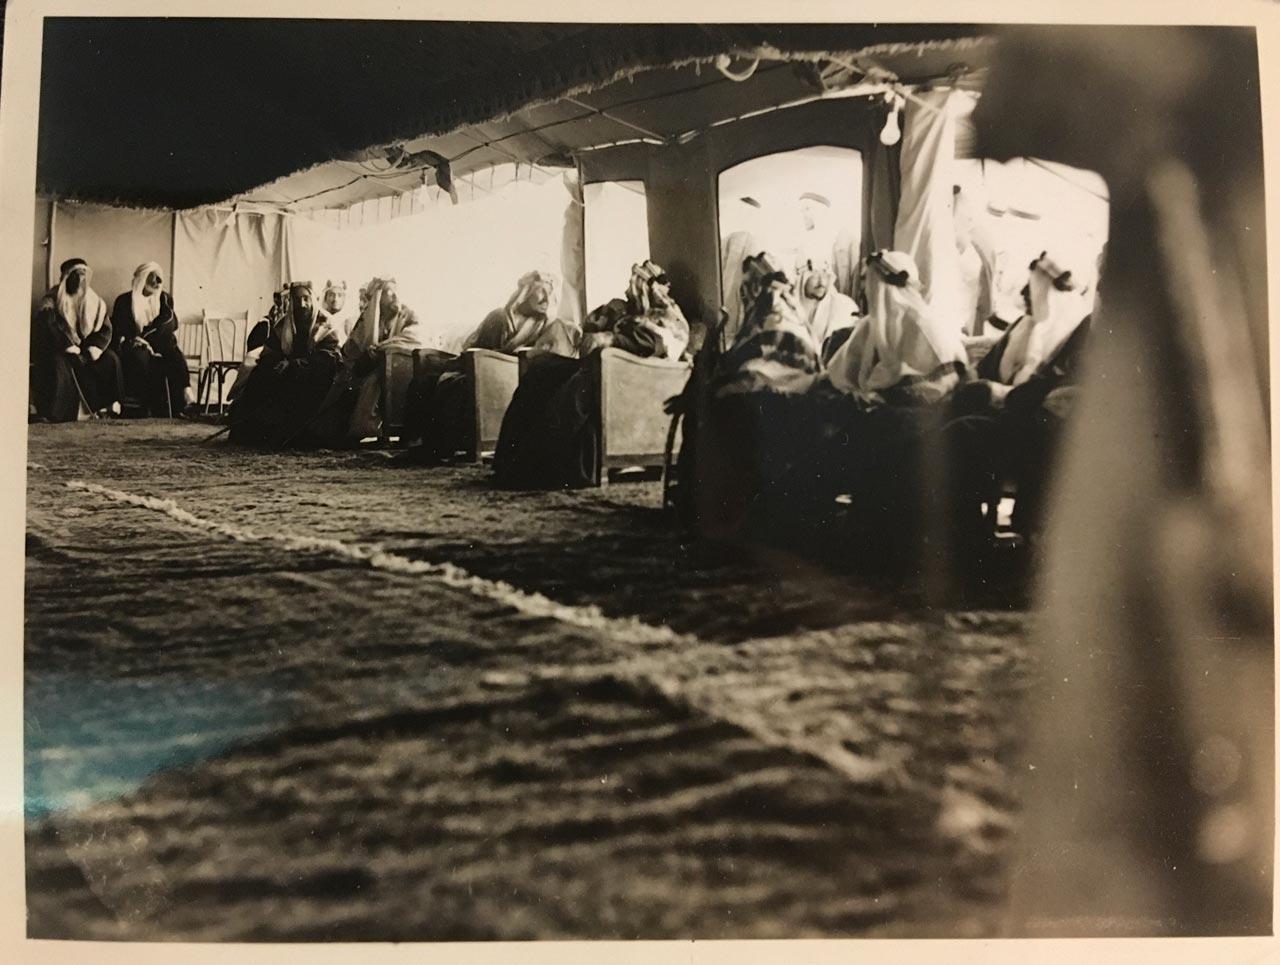 Abdul Aziz (Ibn Saud) 1939 visit with Shaikh Hamad, Ruler of Bahrain.